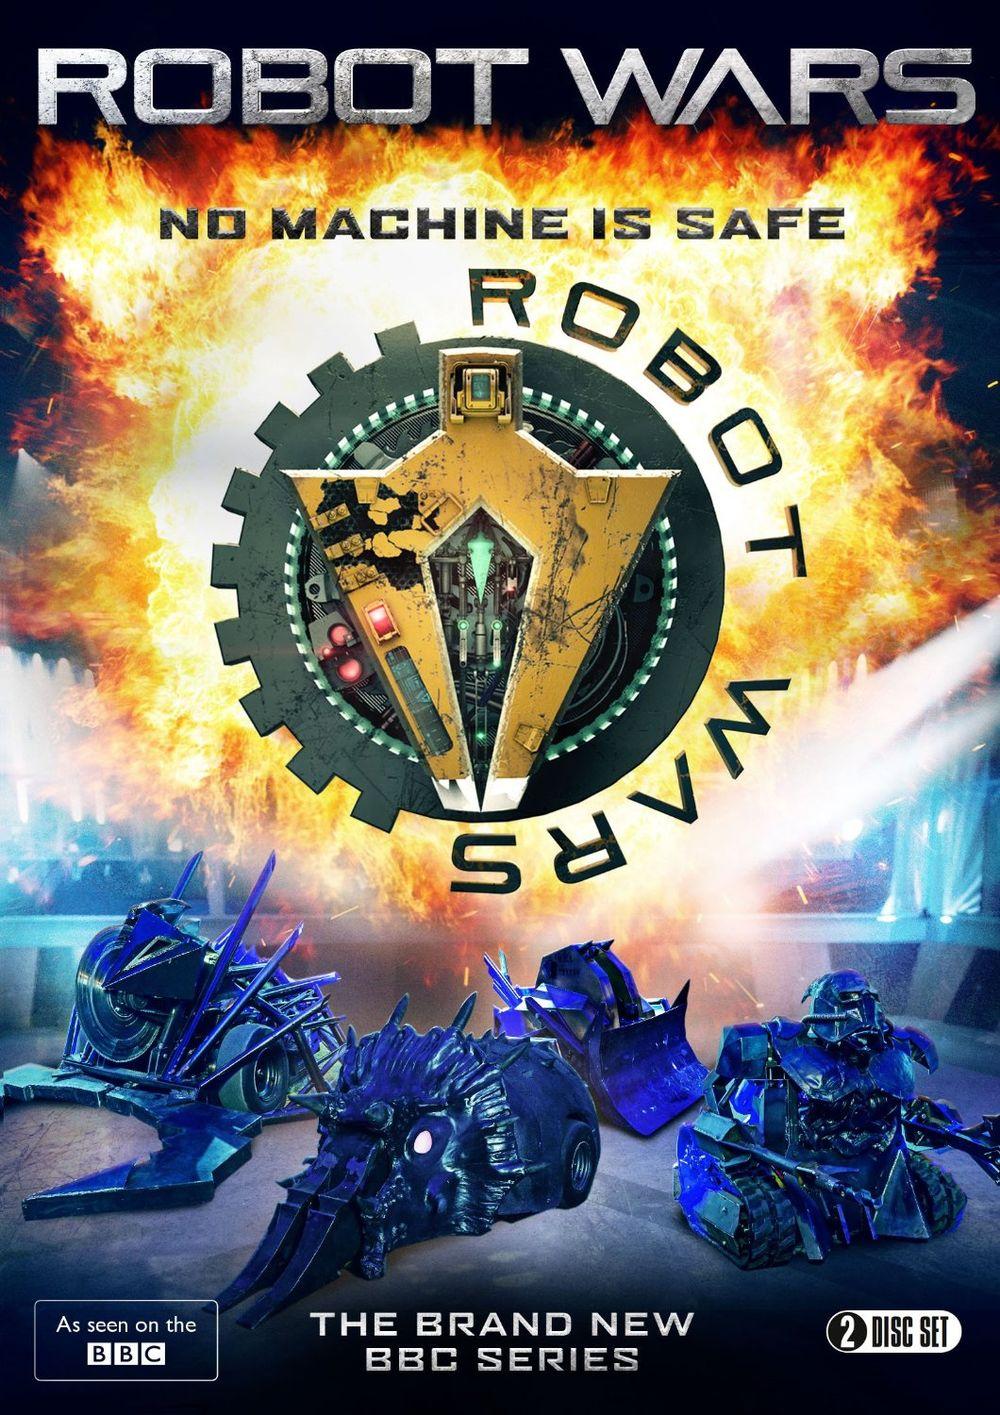 http://img5.downloadha.com/hosein/Movie/March%202017/Robot-Wars-Season-2-2017-cover-large.jpg